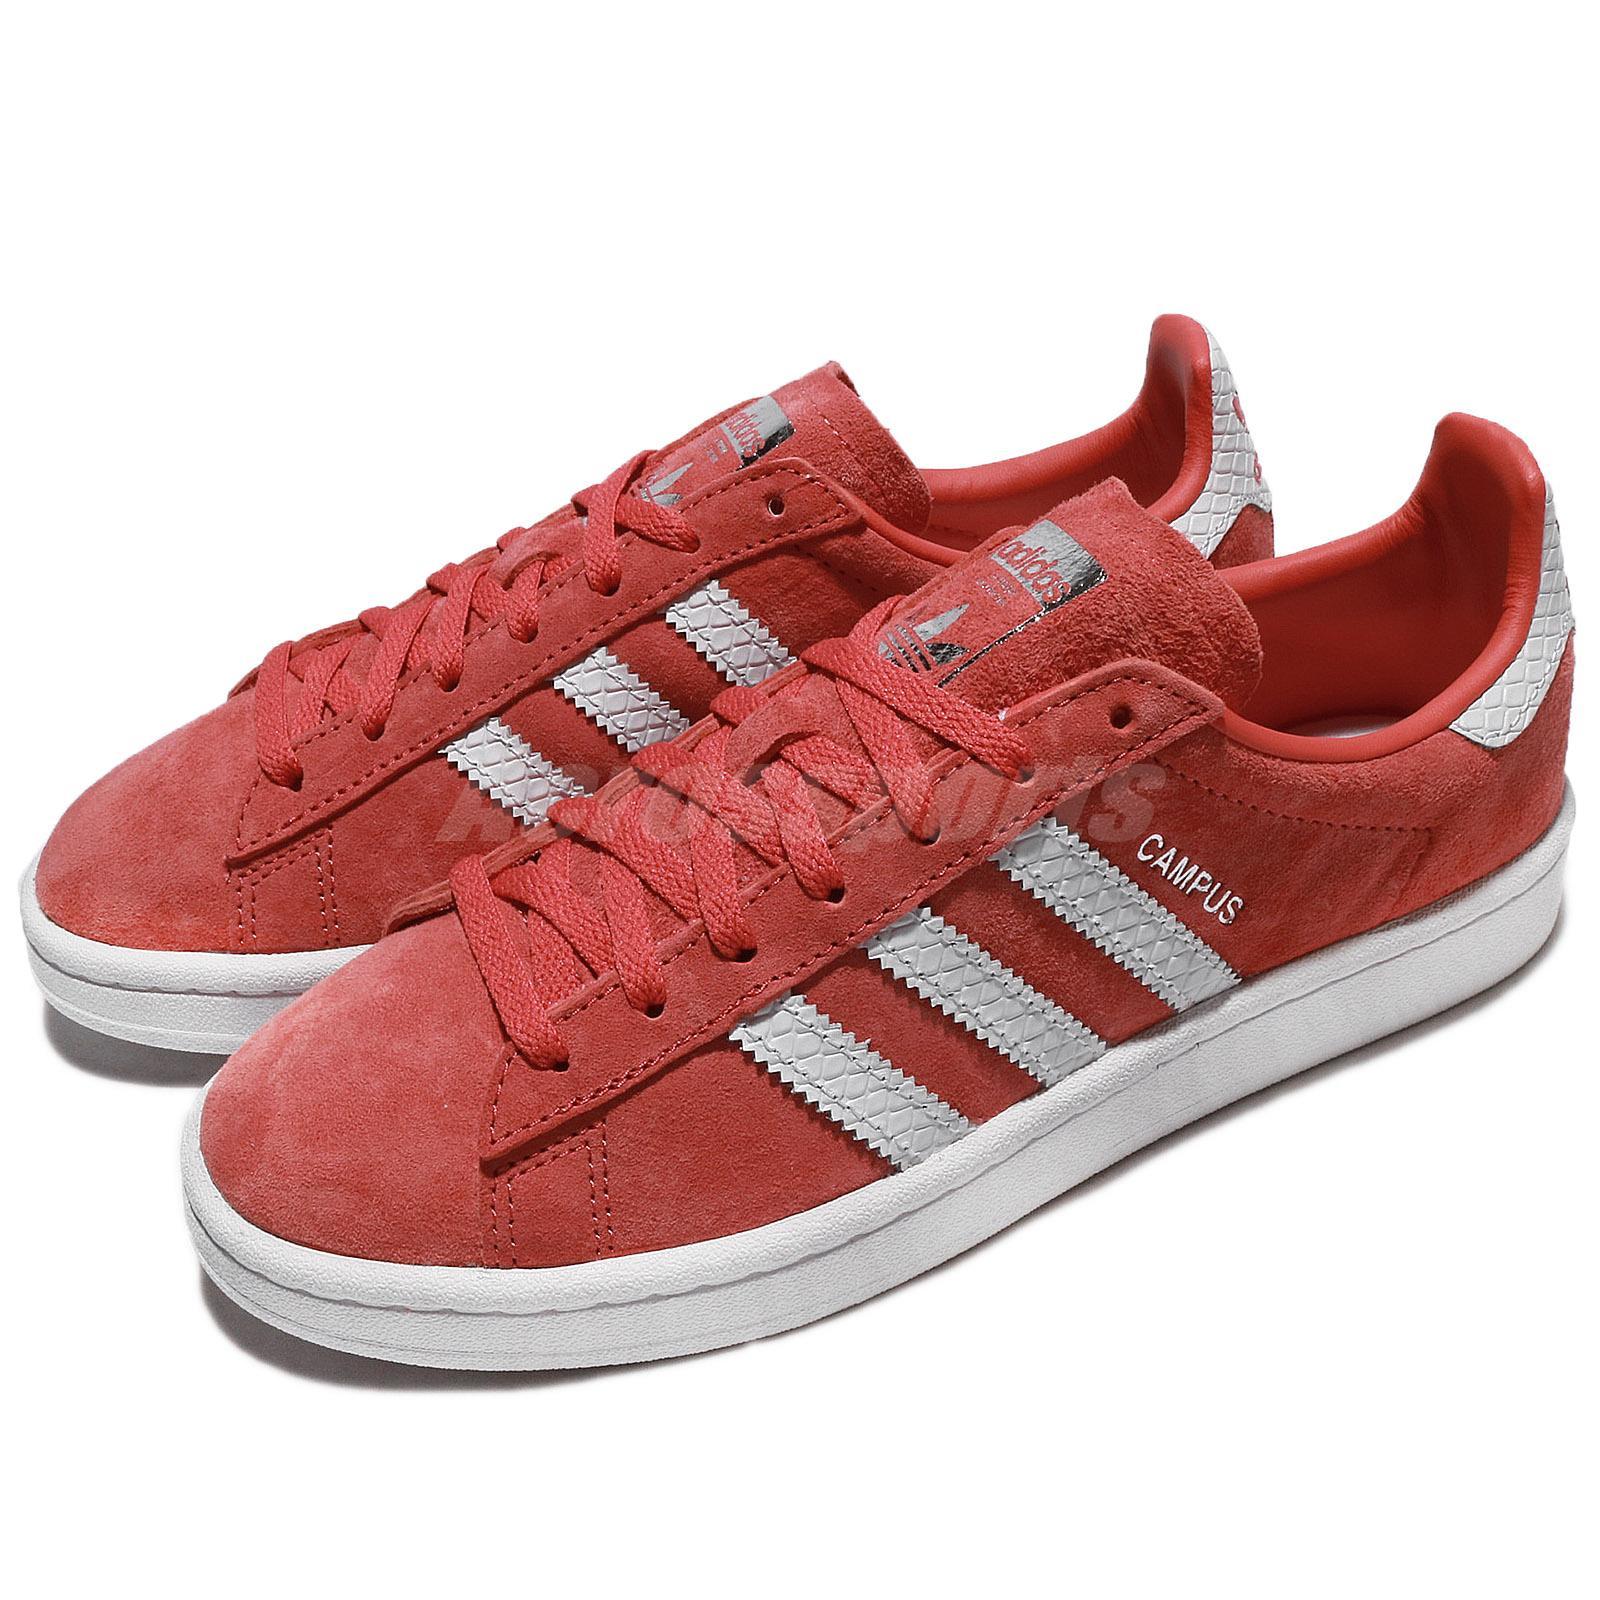 776d9cb3b34 Details about adidas Originals Campus W Trace Scarlet White Women Classic  Shoes Sneaker CQ2099